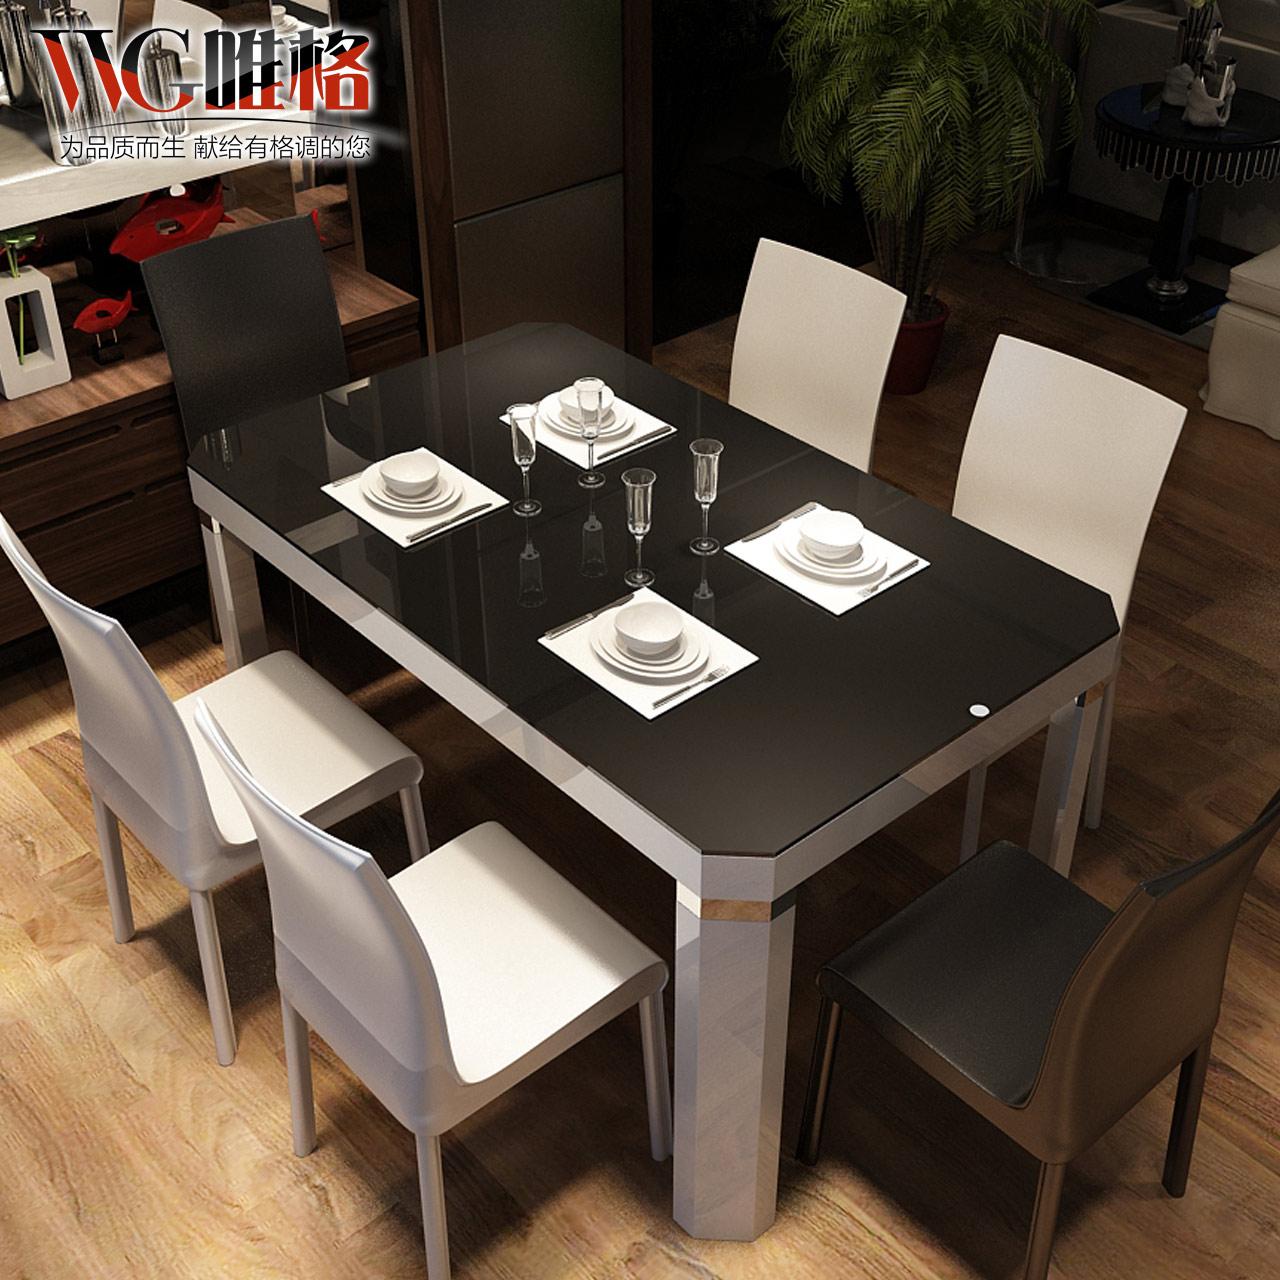 vvg高档现代长方形餐桌椅1096305